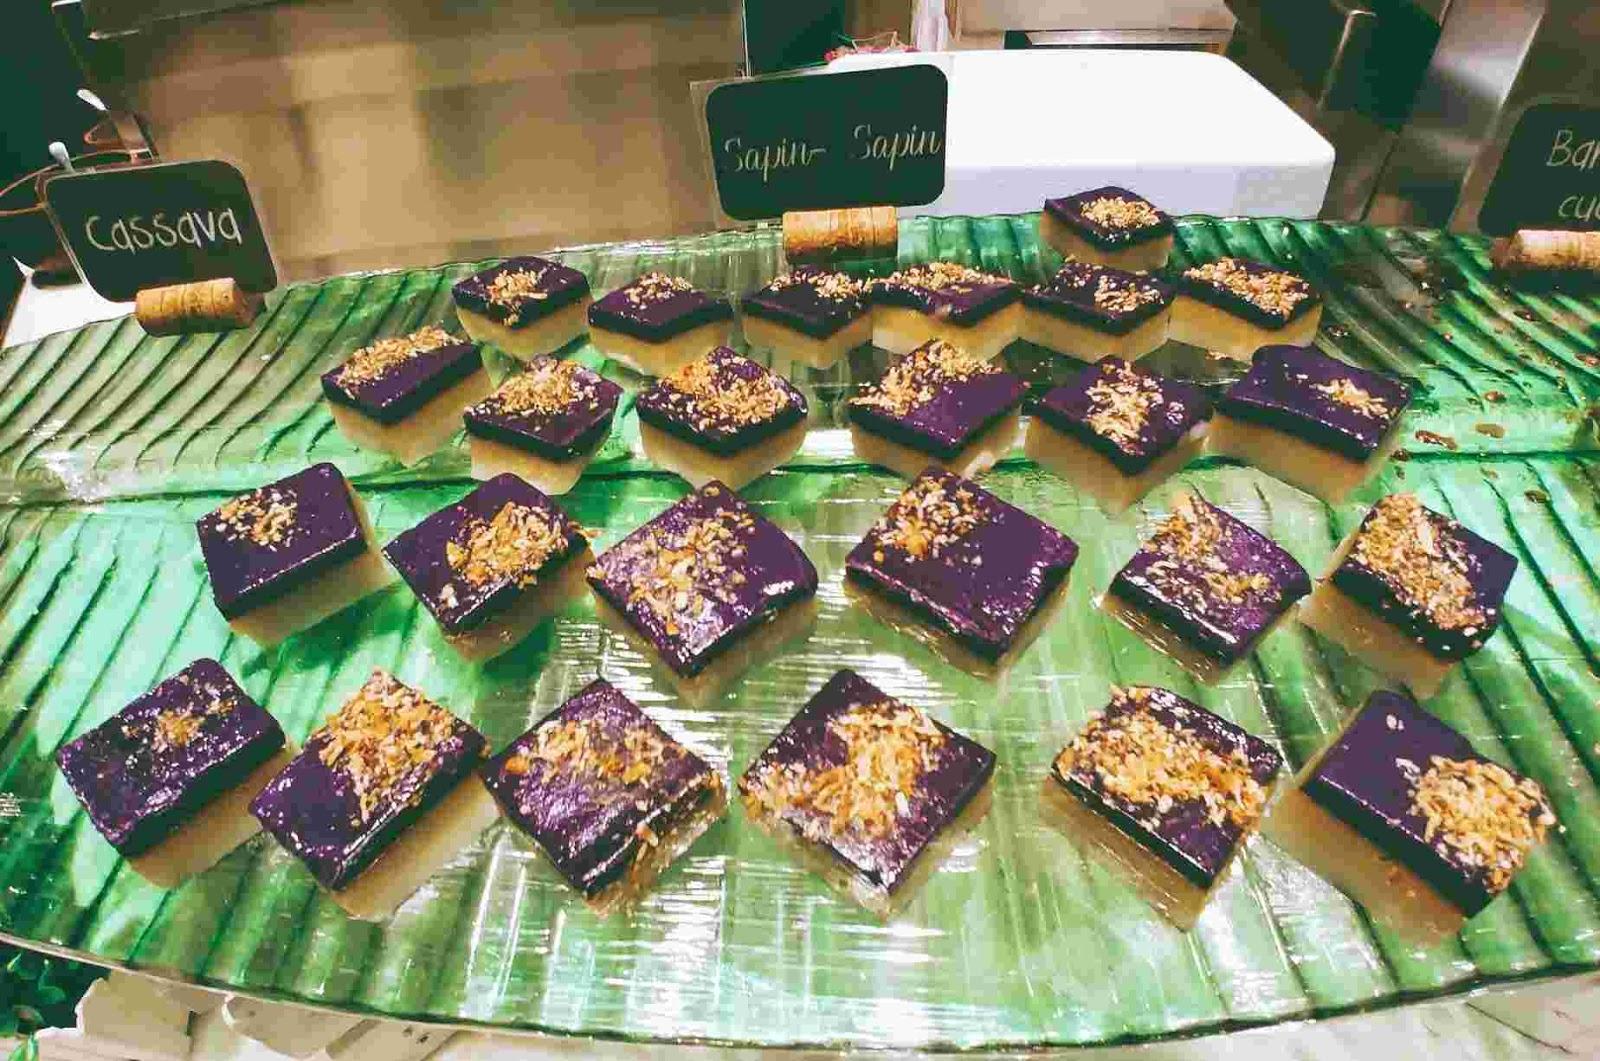 Vikings Luxury Buffet: sapin sapin or native cakes